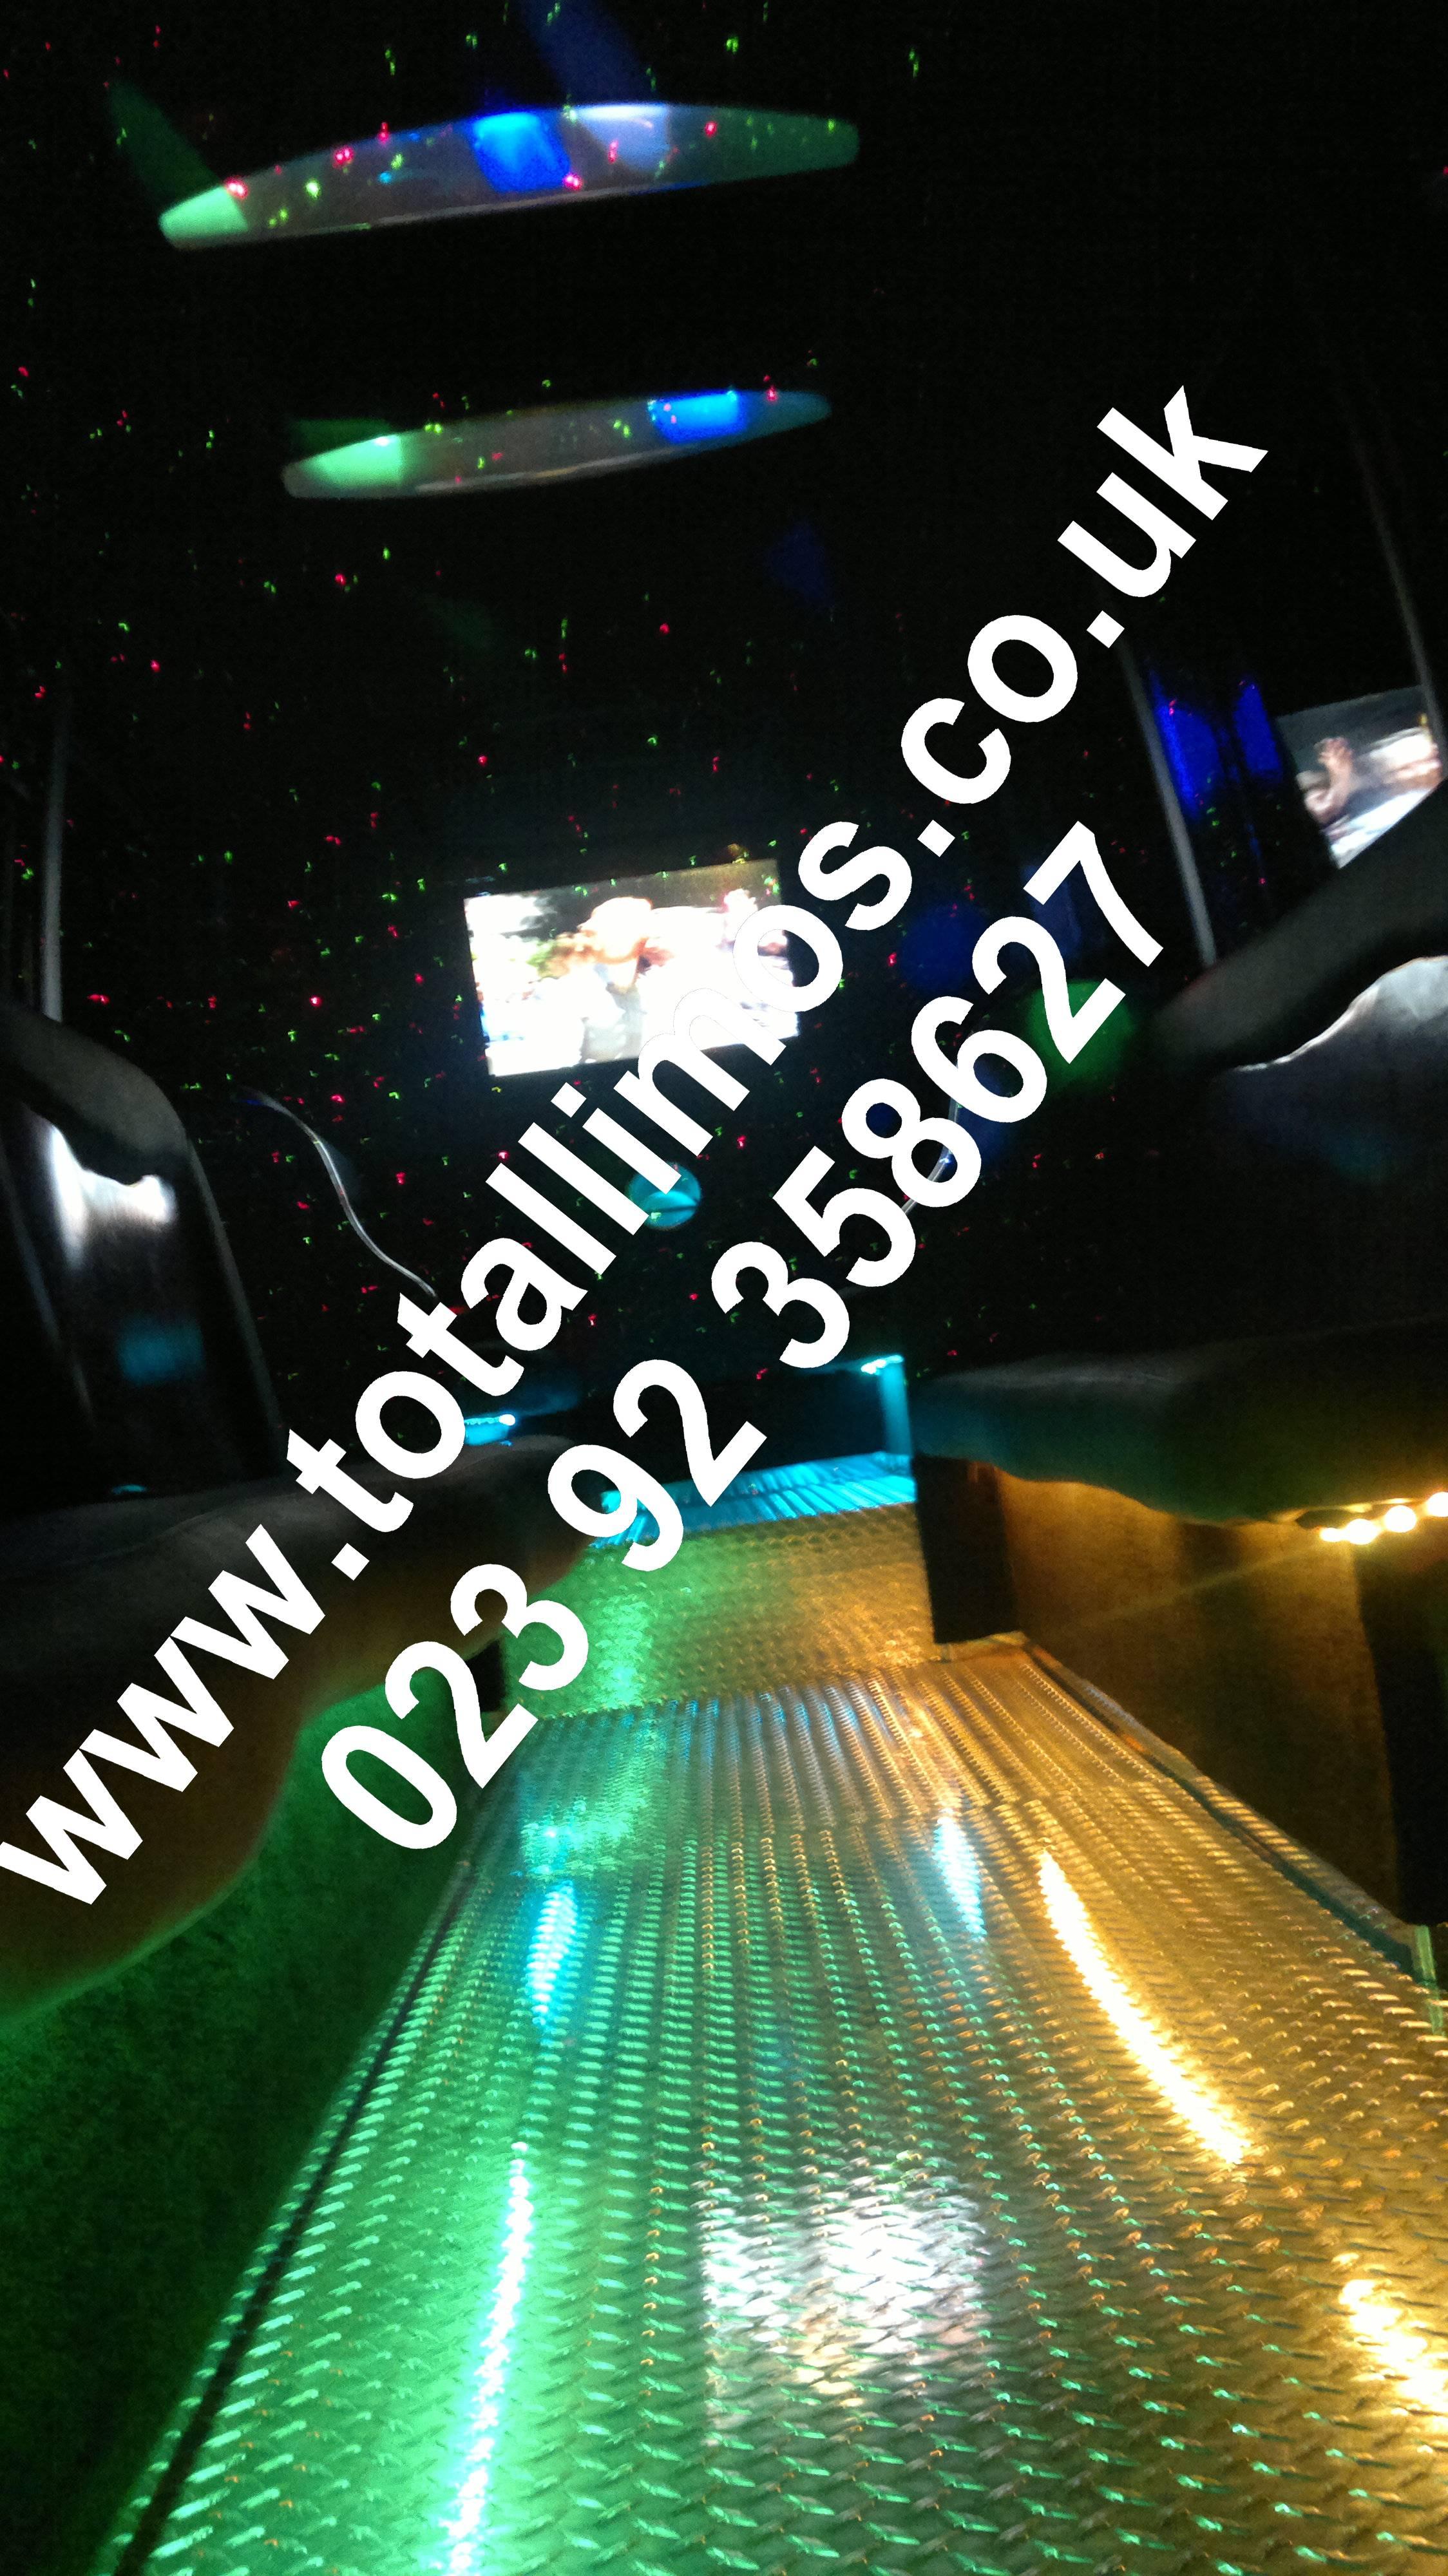 webassets/pink_limo_bus.jpg